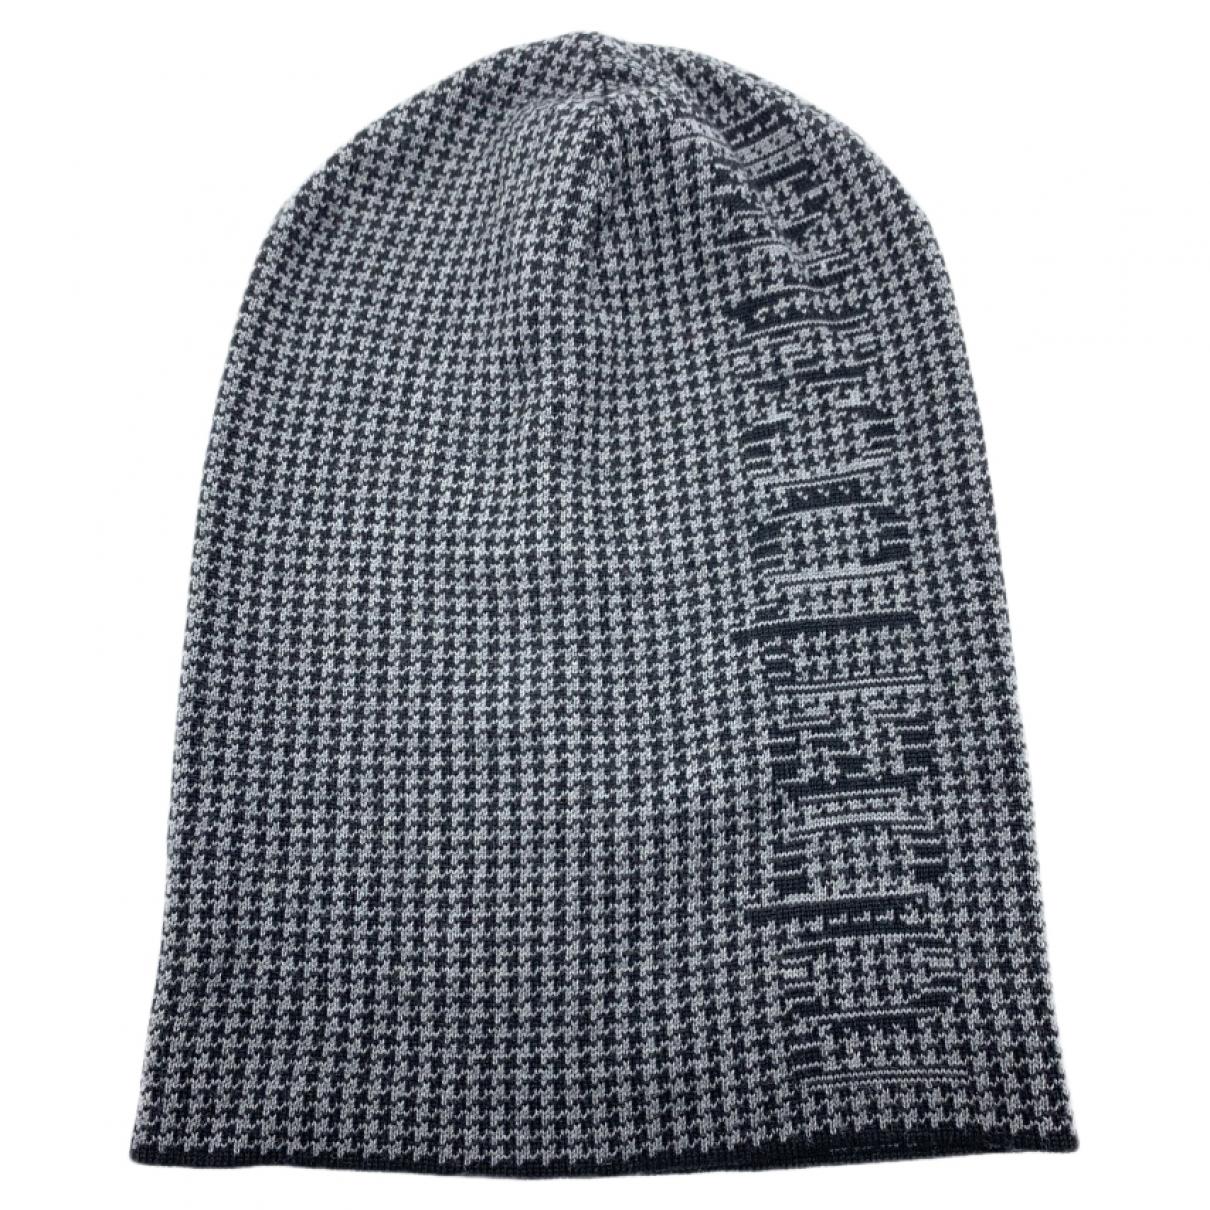 Roberto Cavalli \N Grey Wool hat for Women S International